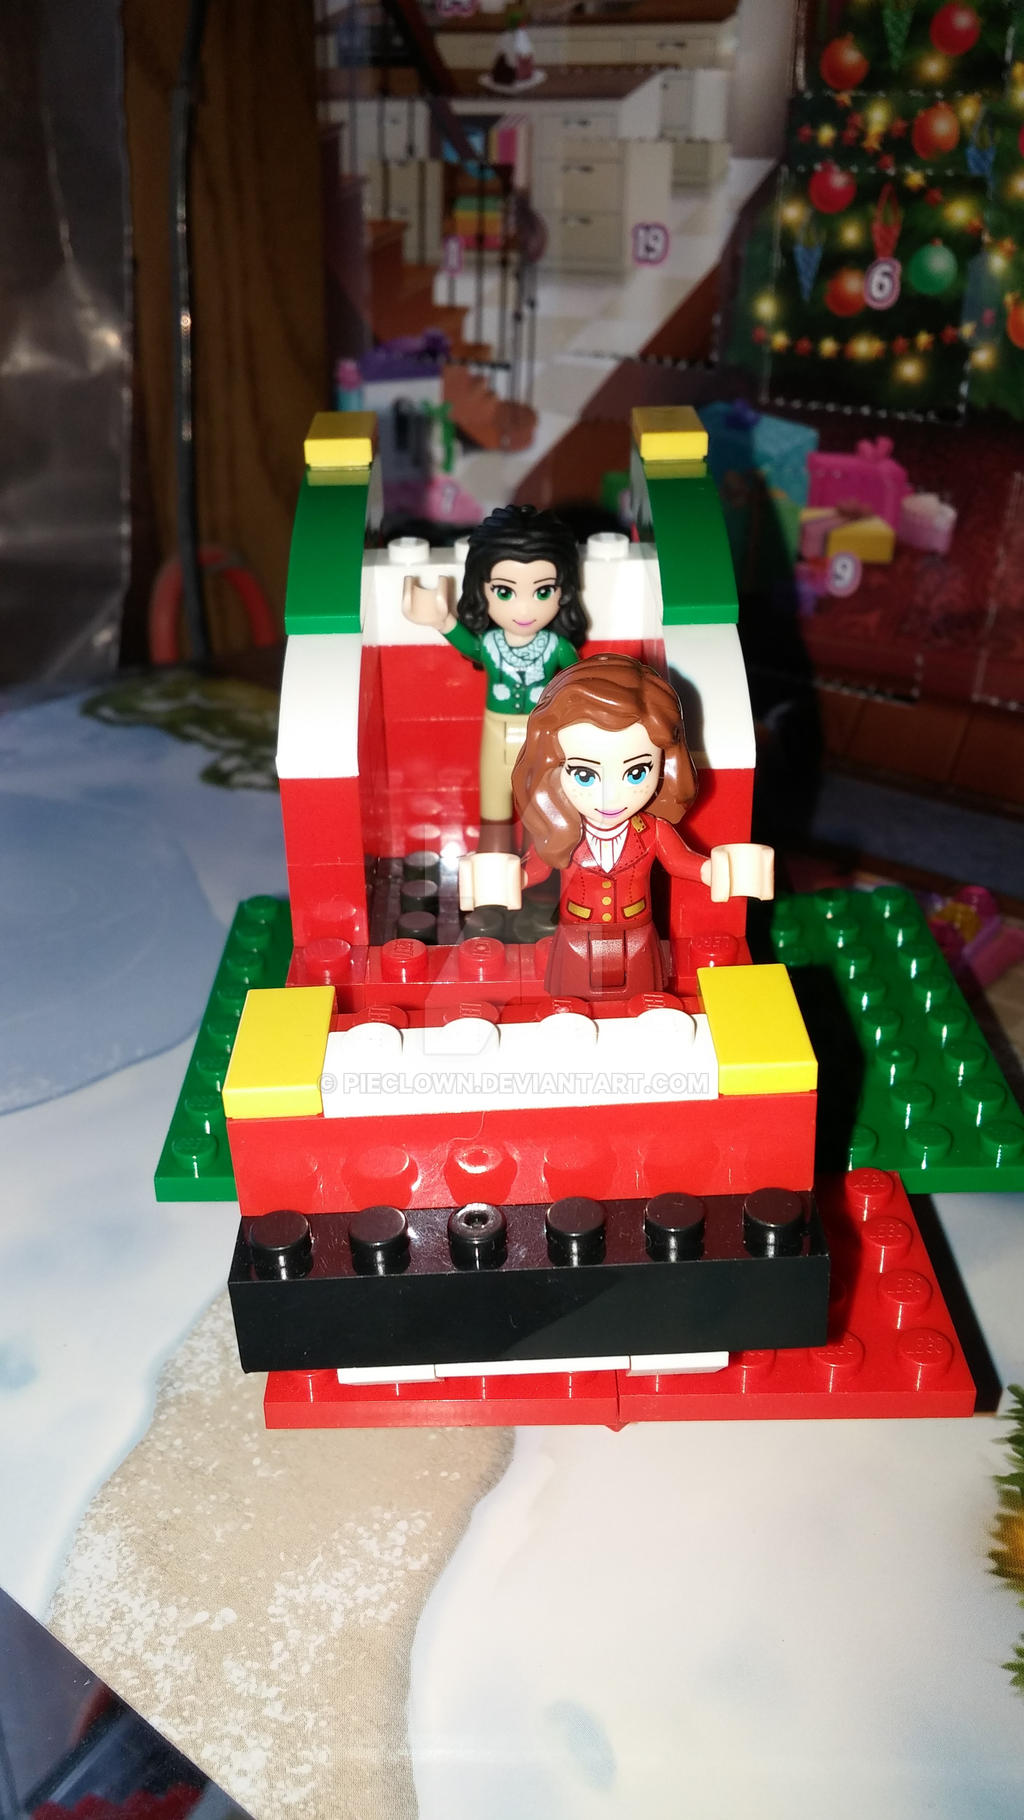 Lego Sleigh by pieclown